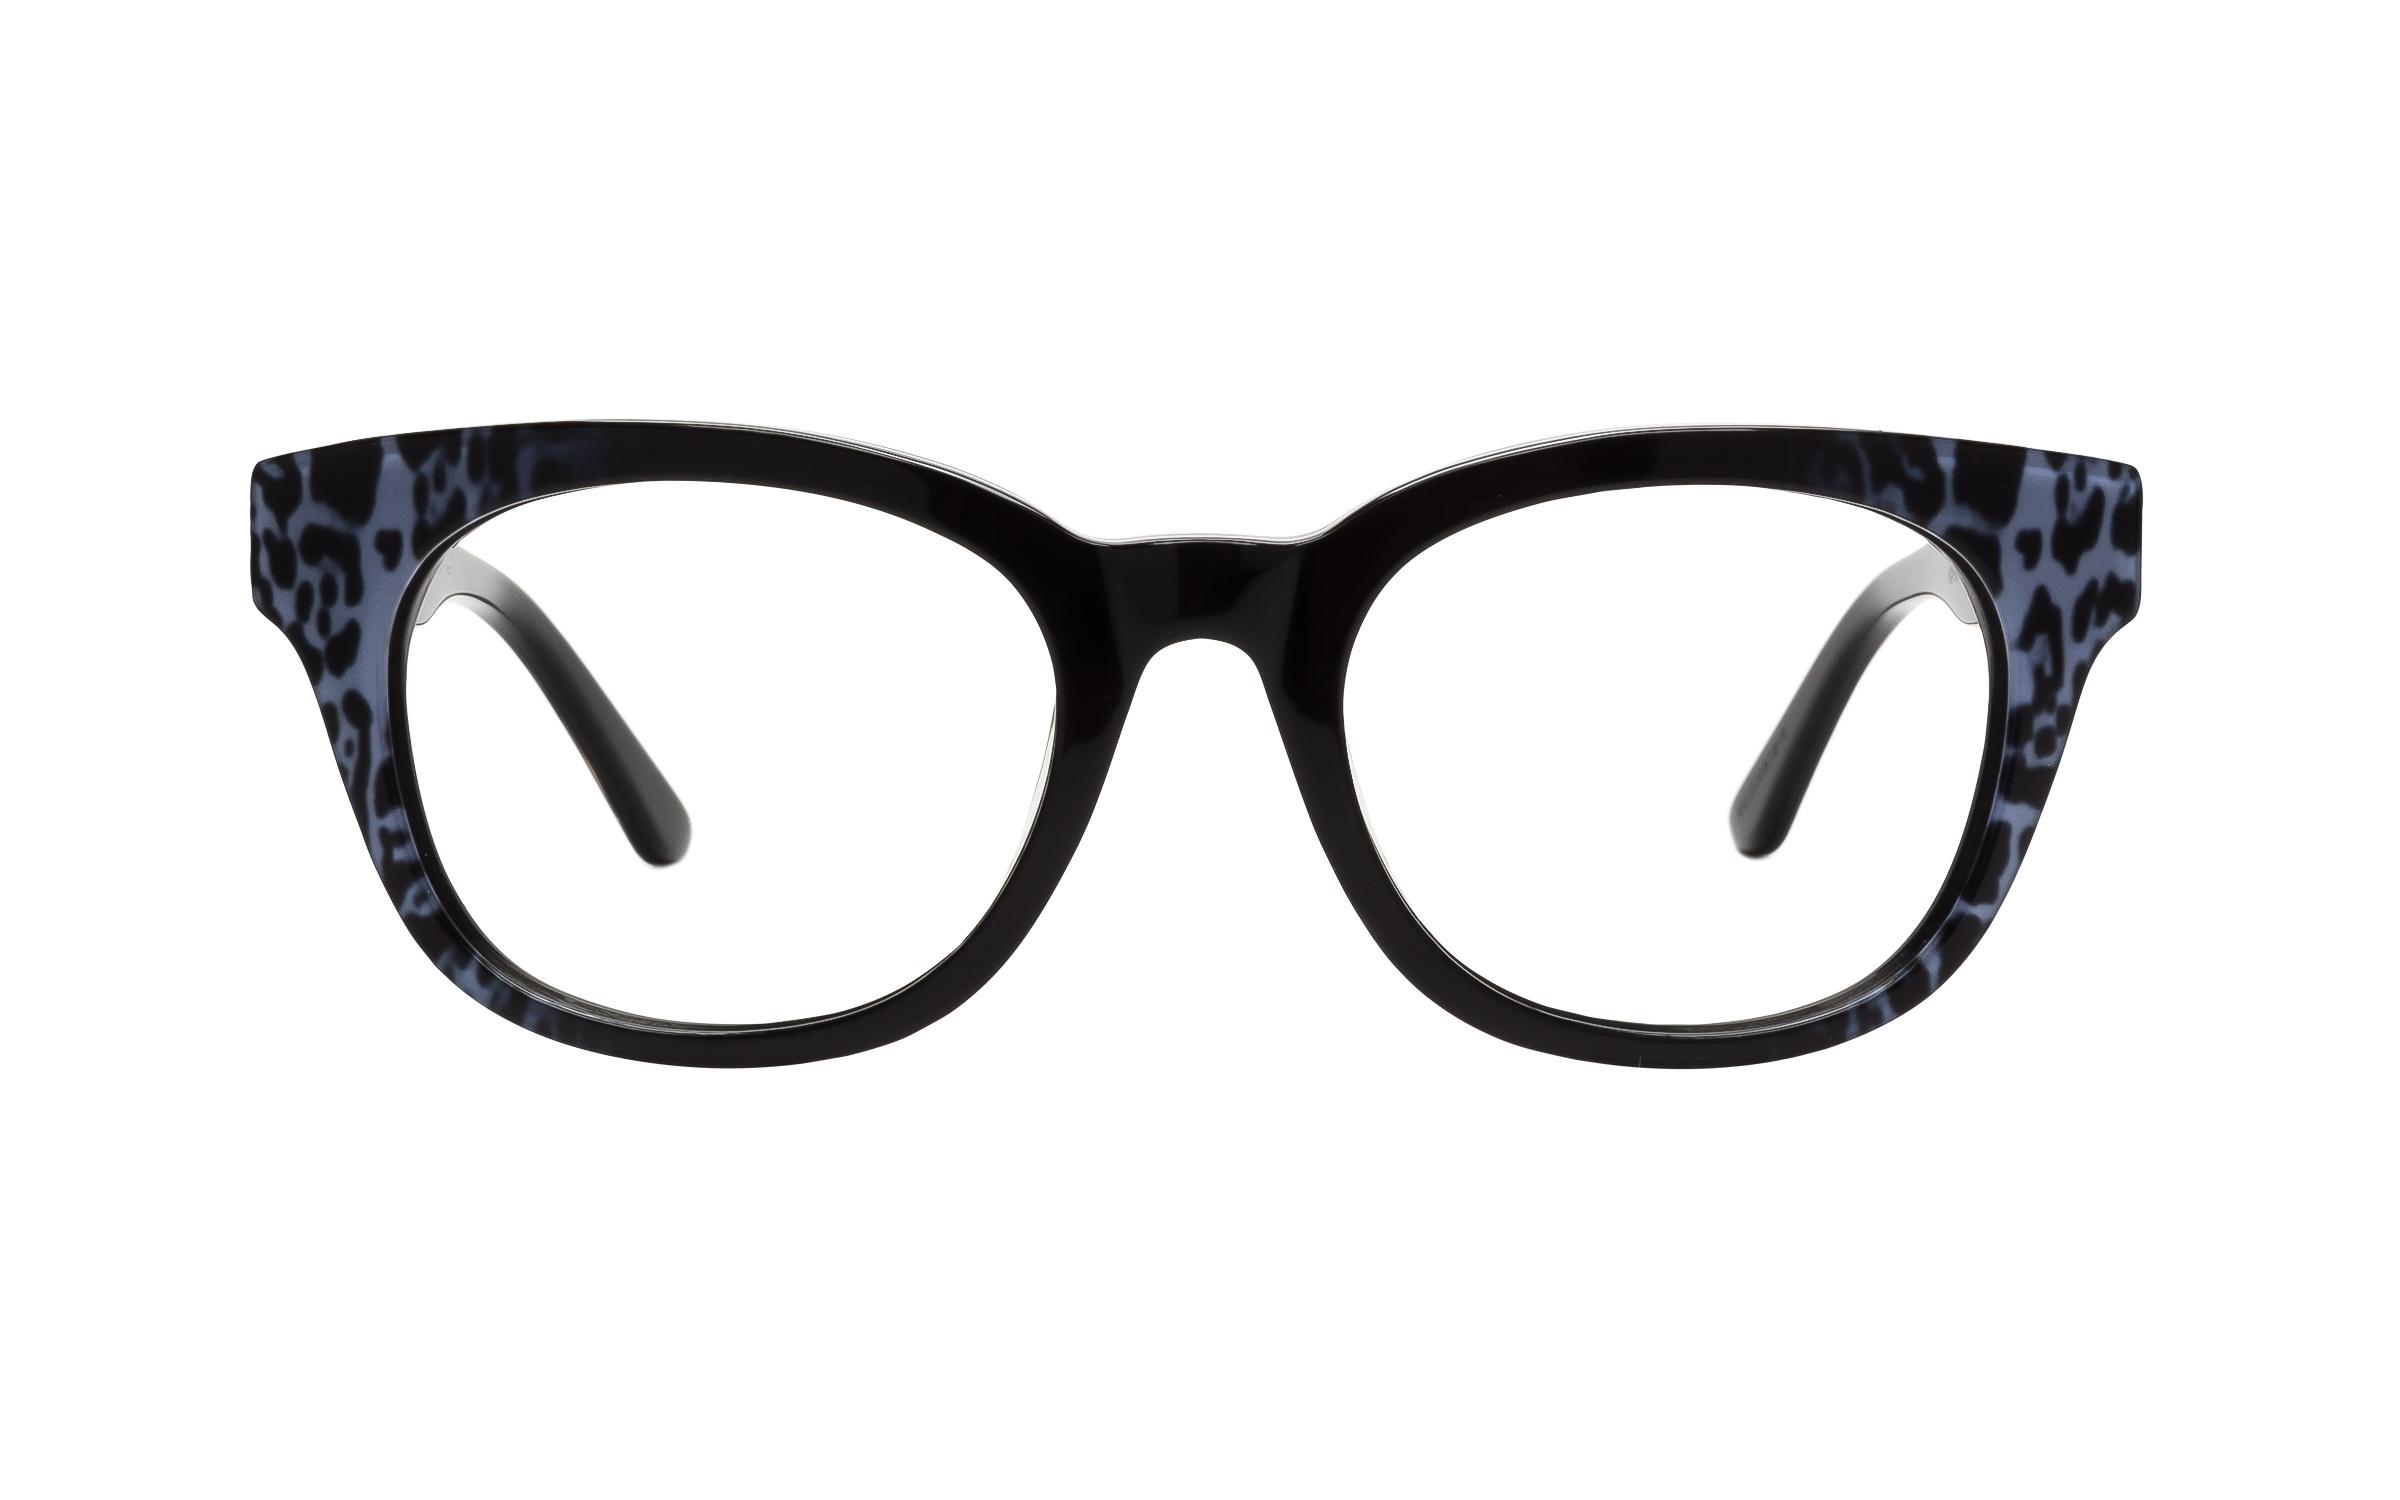 Jessica Simpson J1094 GYAN Grey Animal Glasses, Eyeglasse...